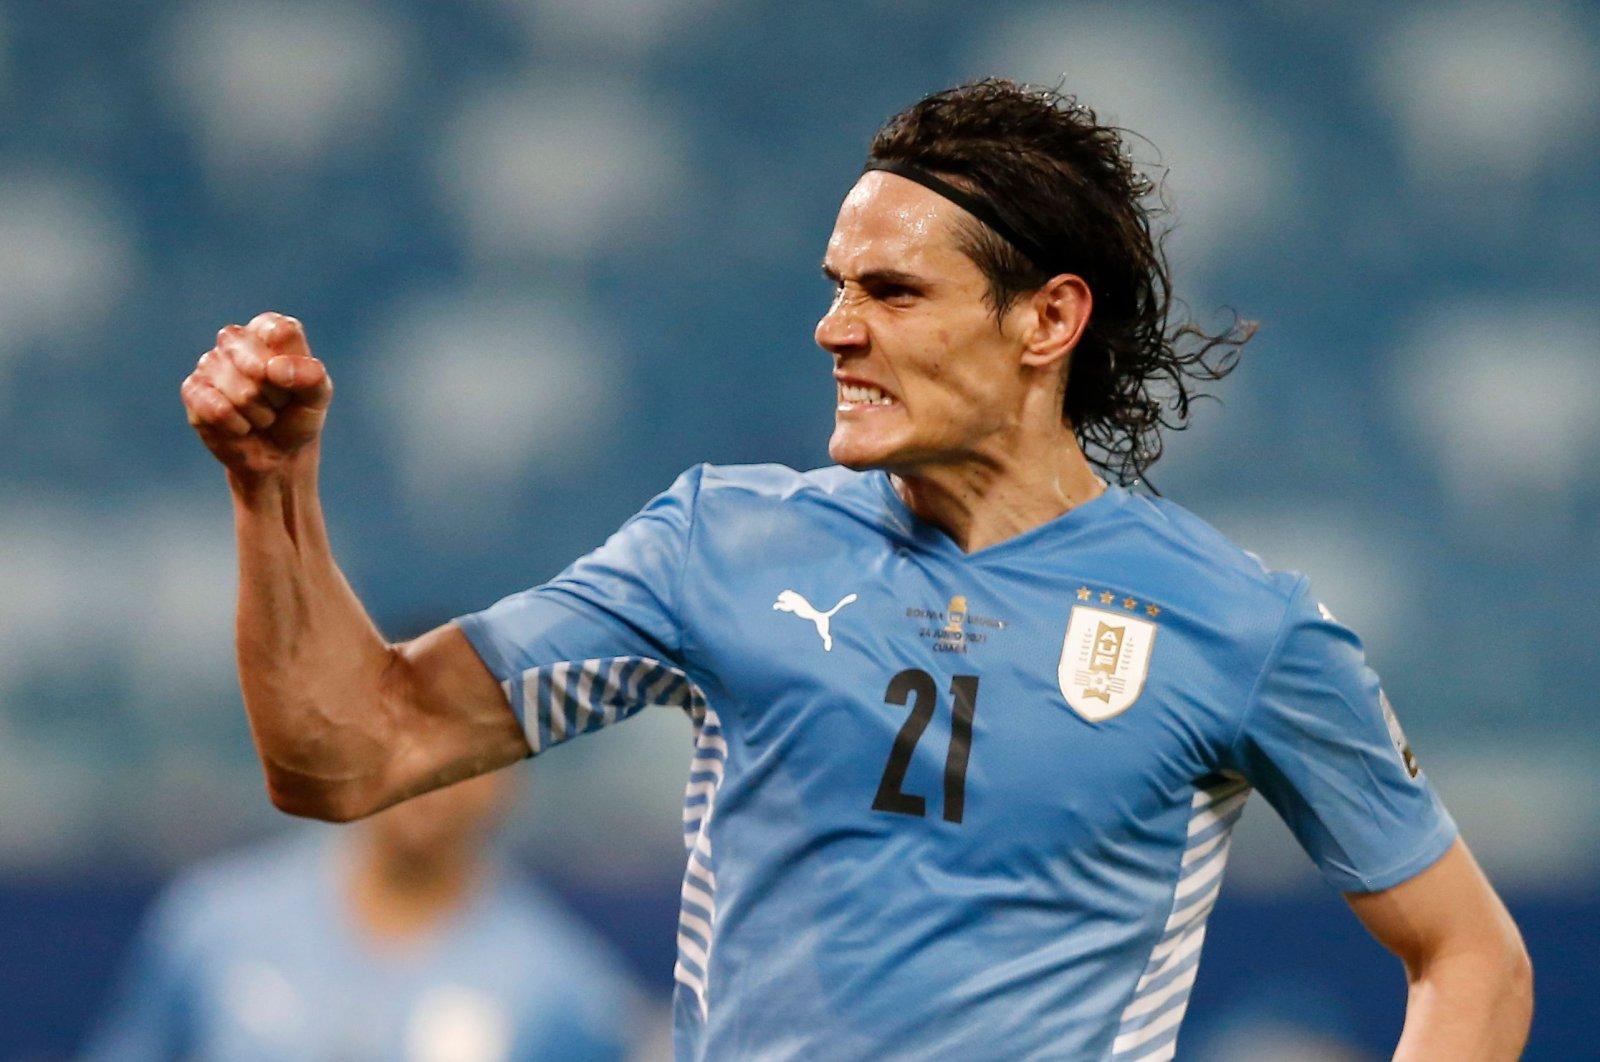 Uruguay's Edison Cavani celebrates scoring his team's second goal in a Copa America Group A match against Bolivia, Cuiaba, Brazil, June 24, 2021. (Reuters Photo)